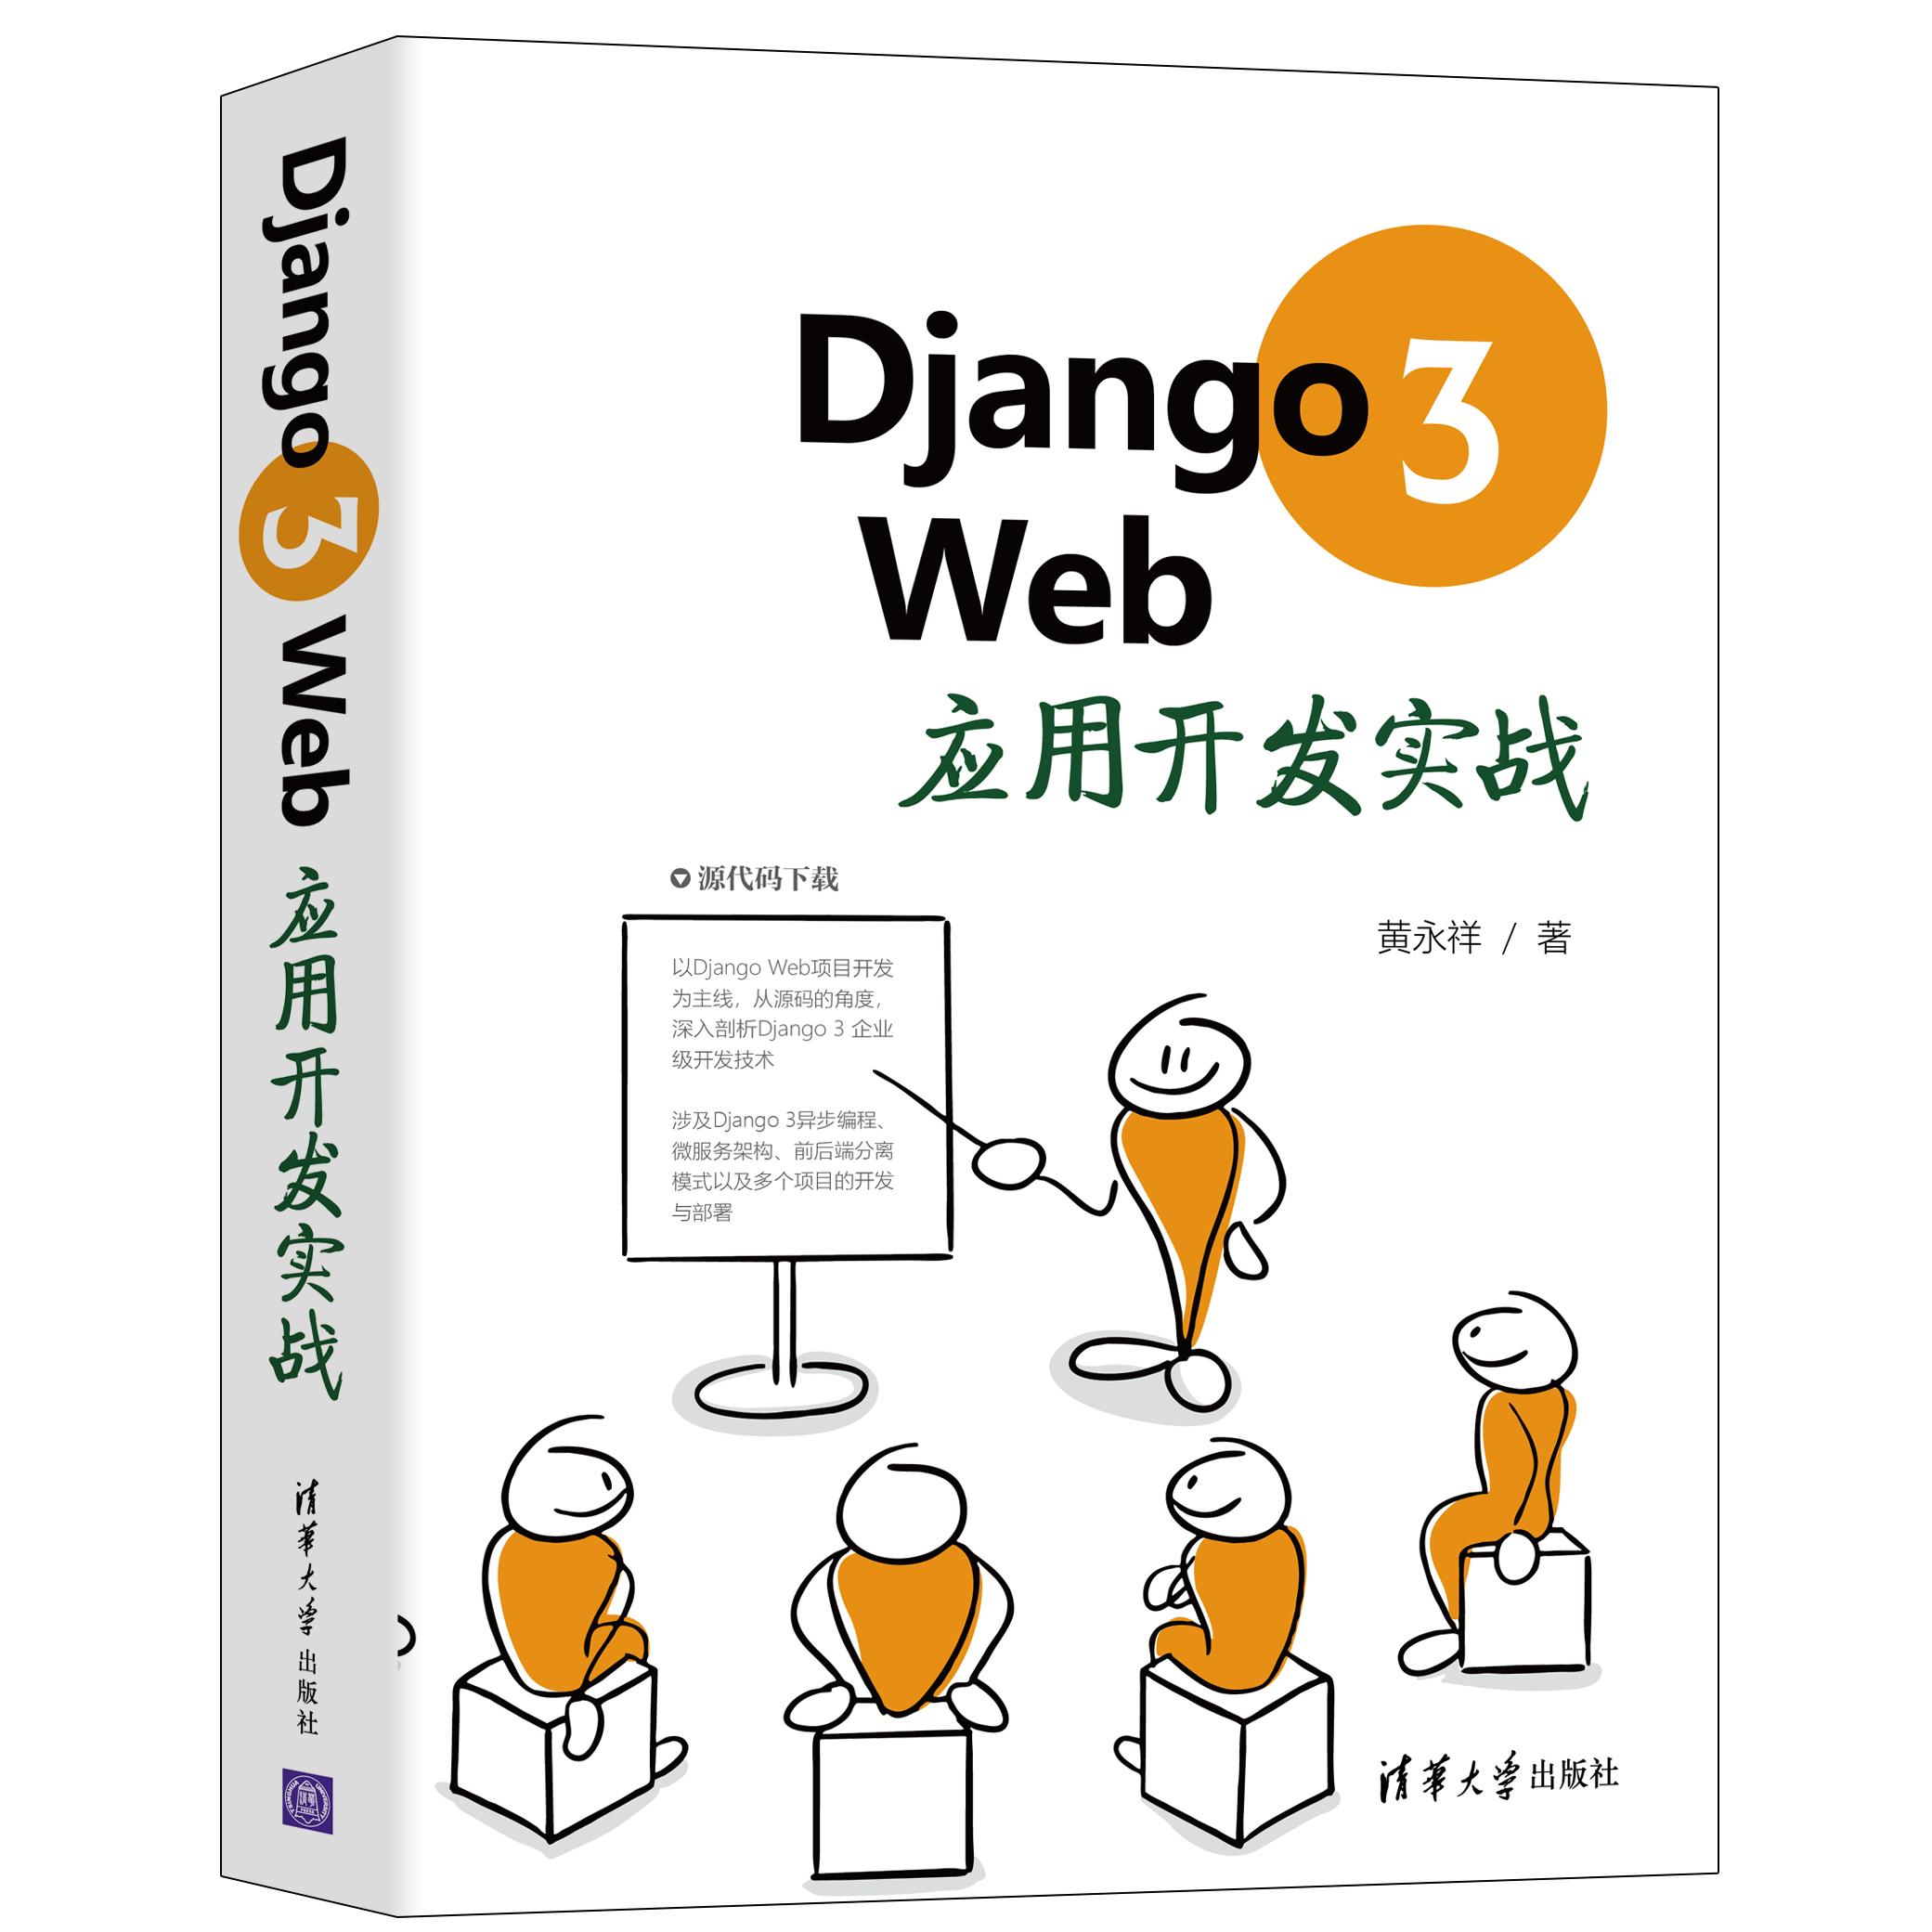 《Django3 Web应用开发实战》